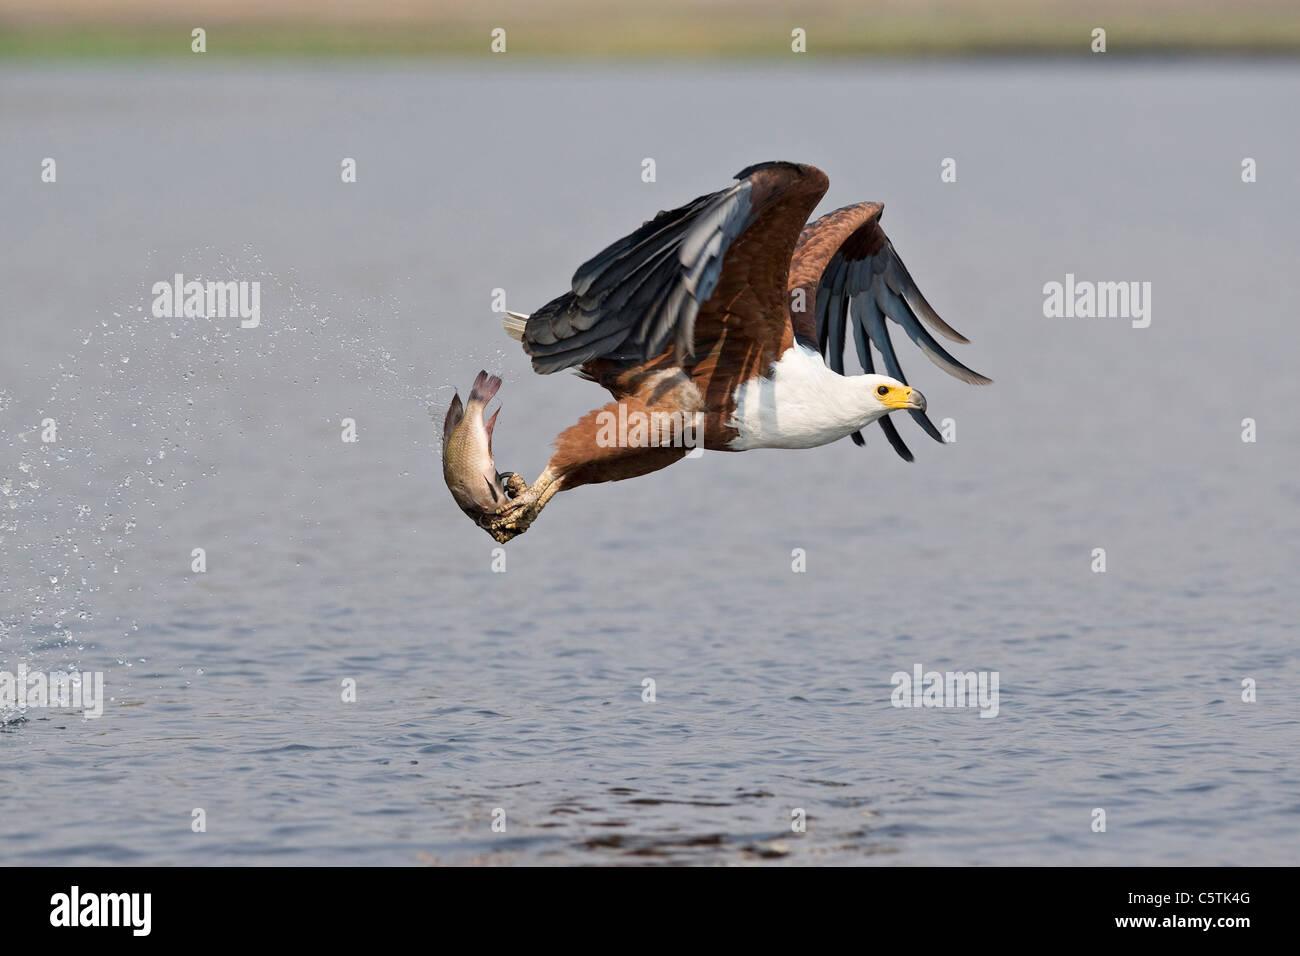 Africa, Botswana, African fish eagle (Haliaeetus vocifer) with catch, taking flight Stock Photo